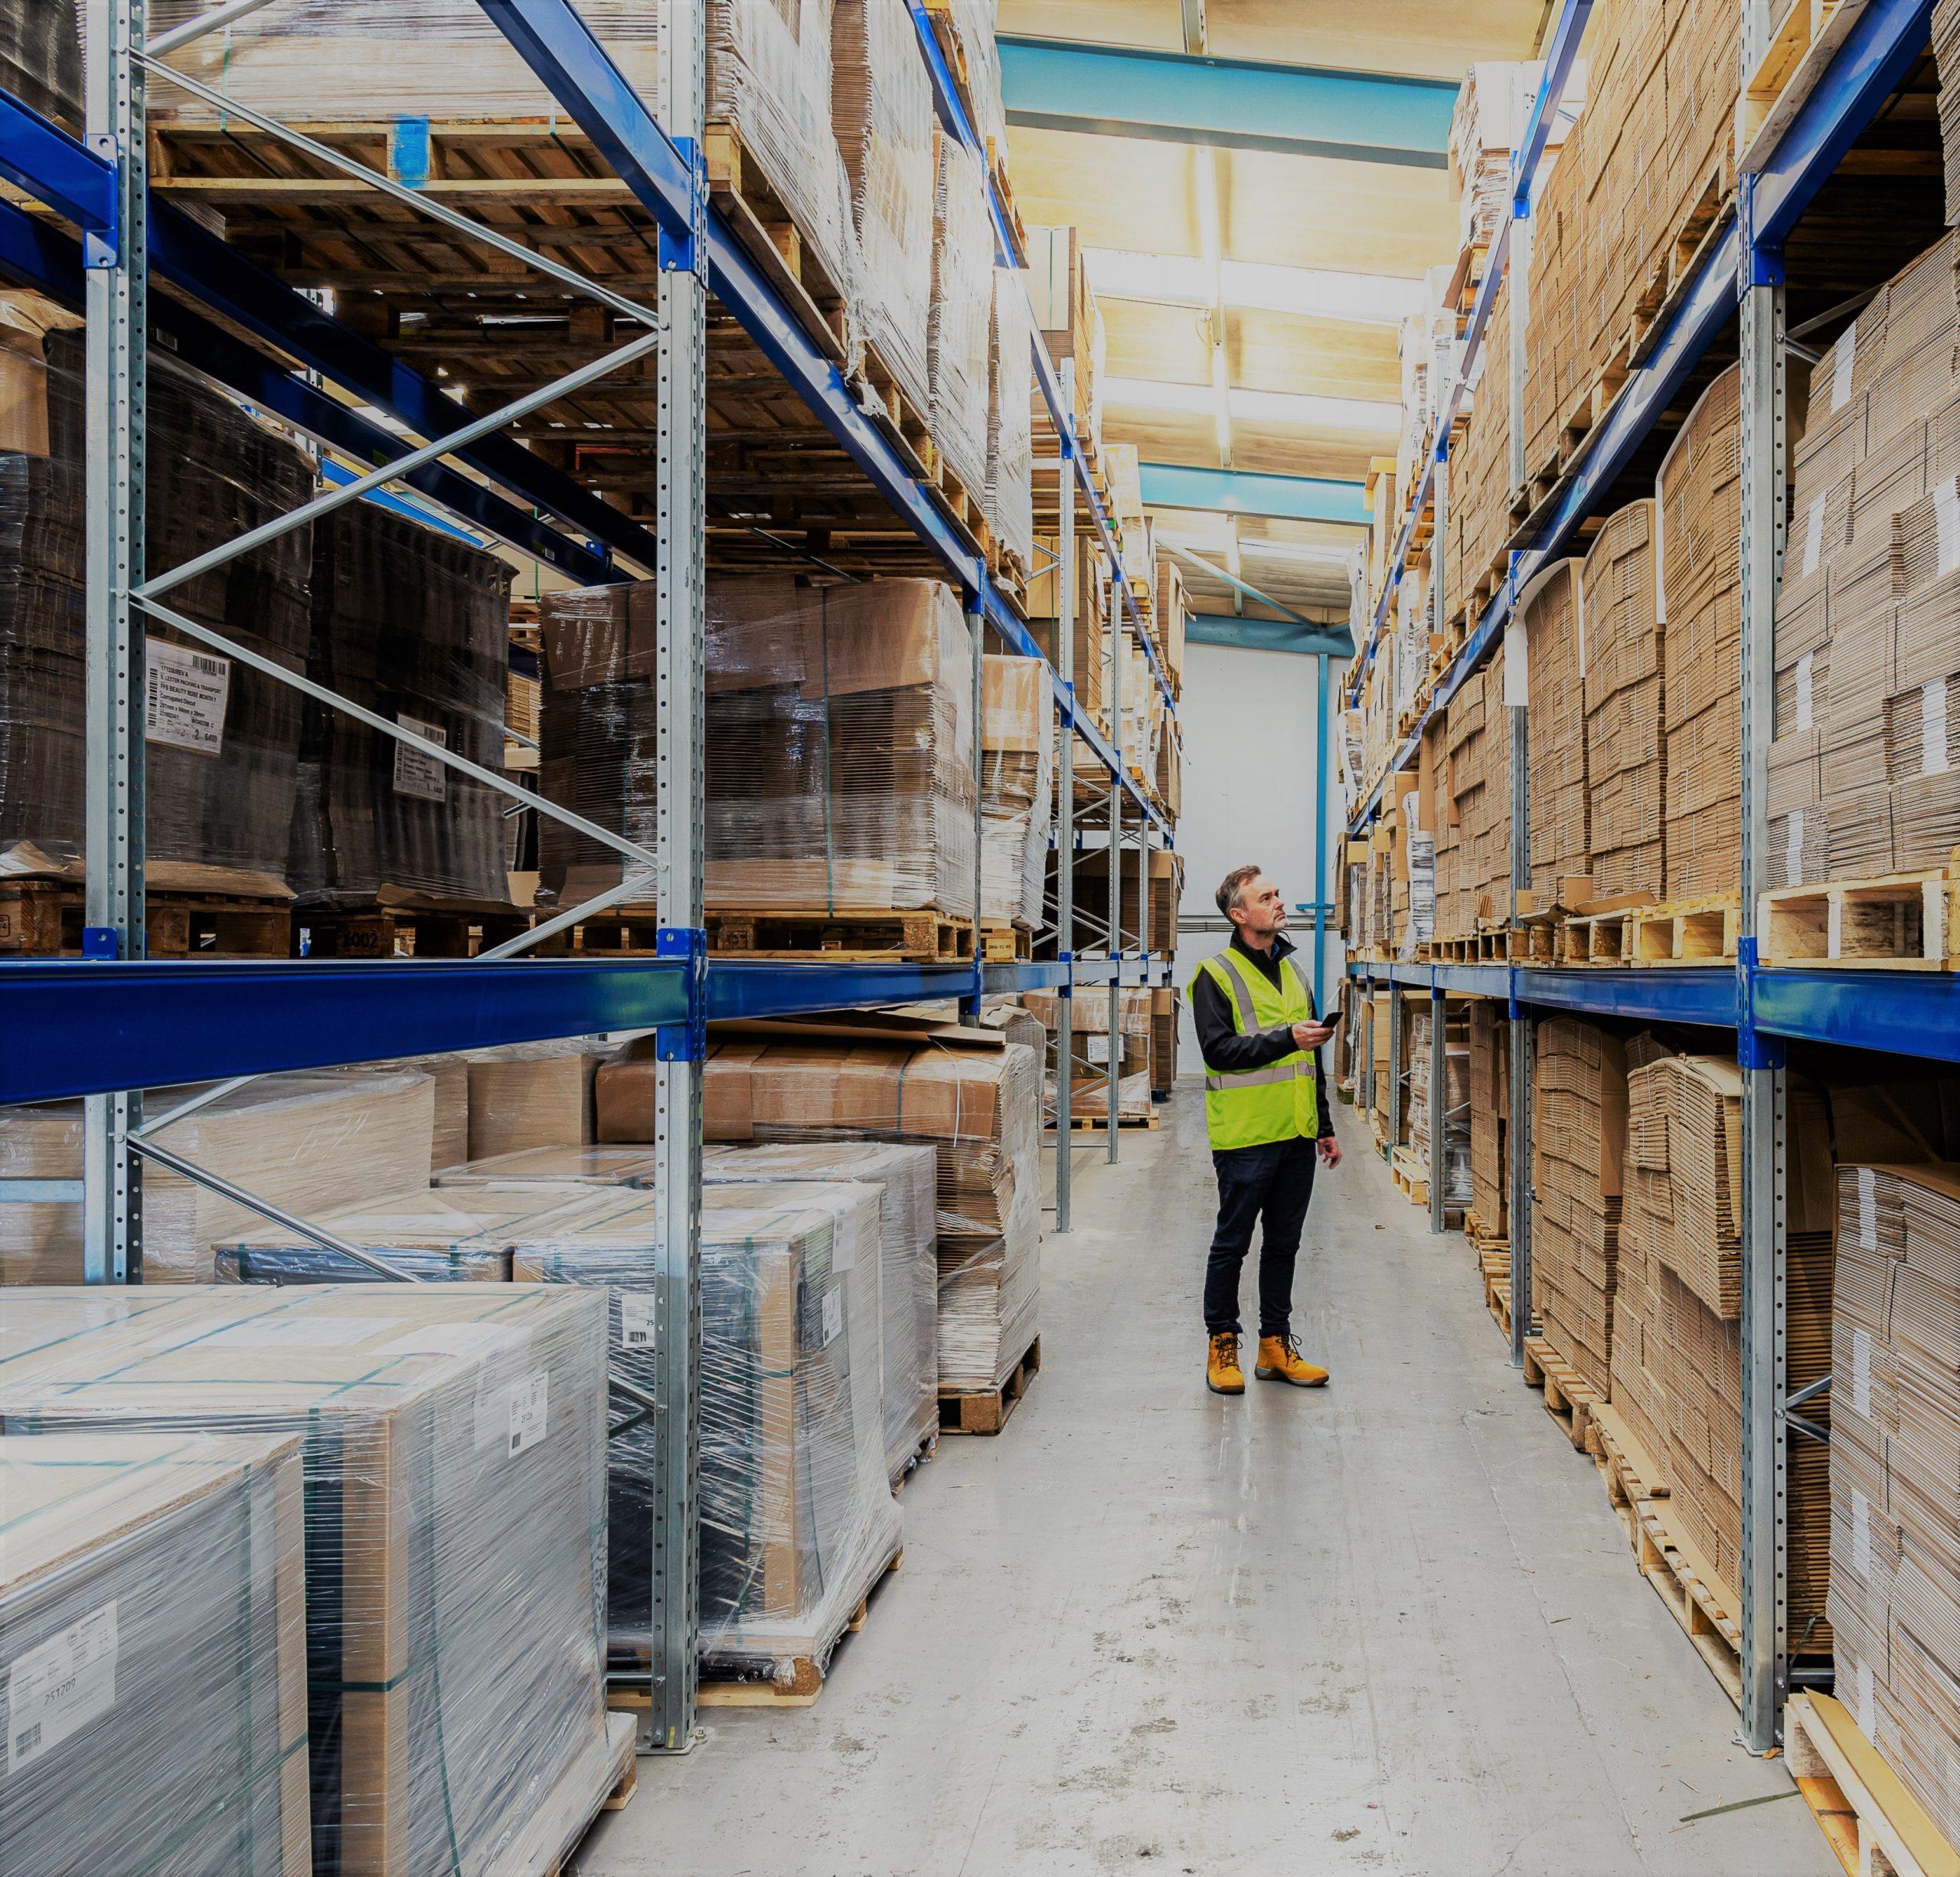 S L Packaging & Transport Ltd